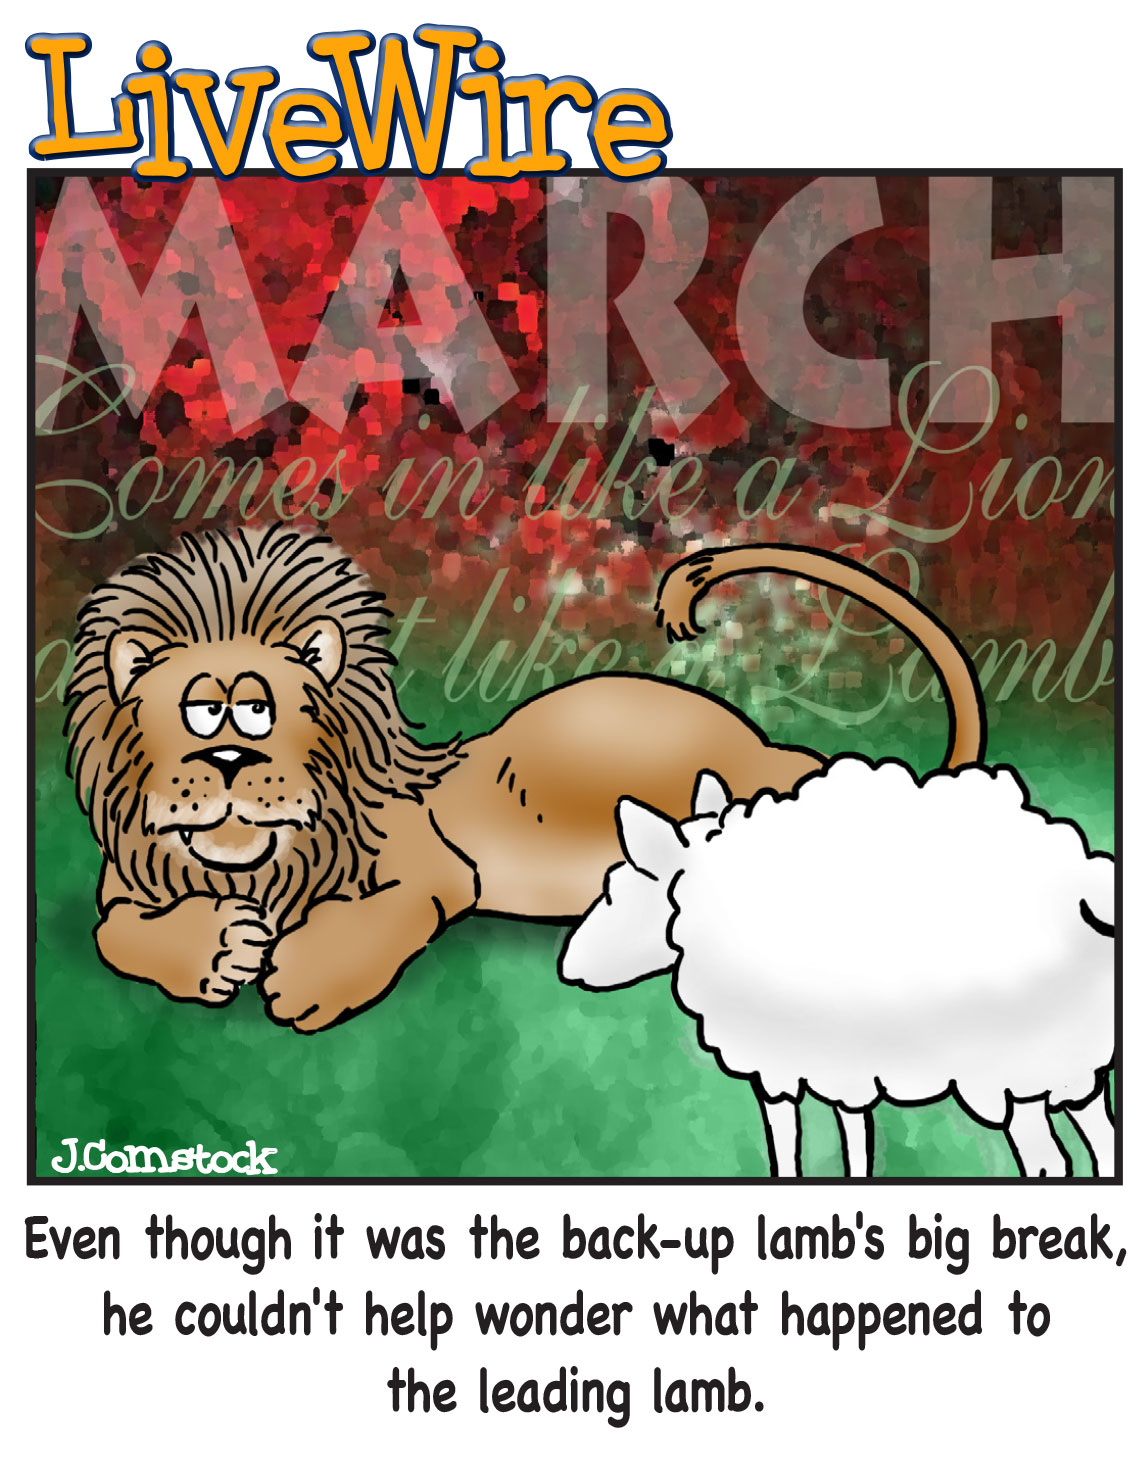 Back-up-lamb